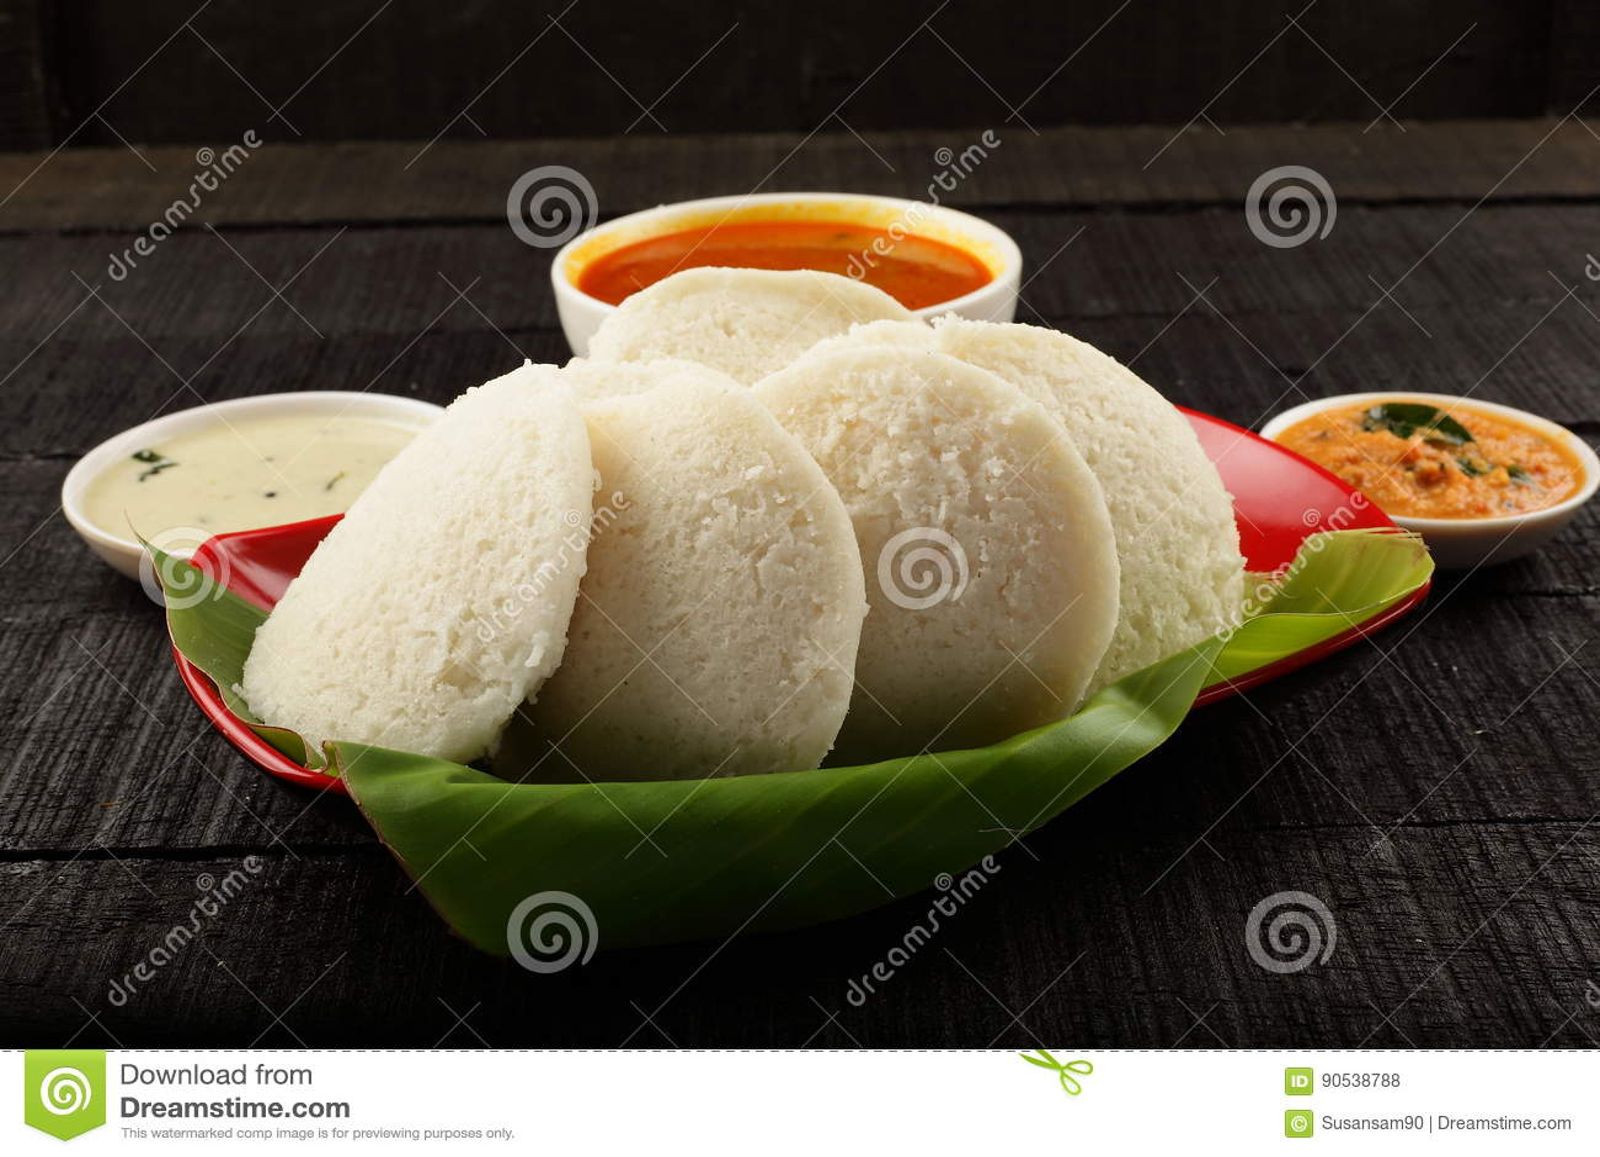 Heerlijk nutteloos gediend met sambar in banaanblad